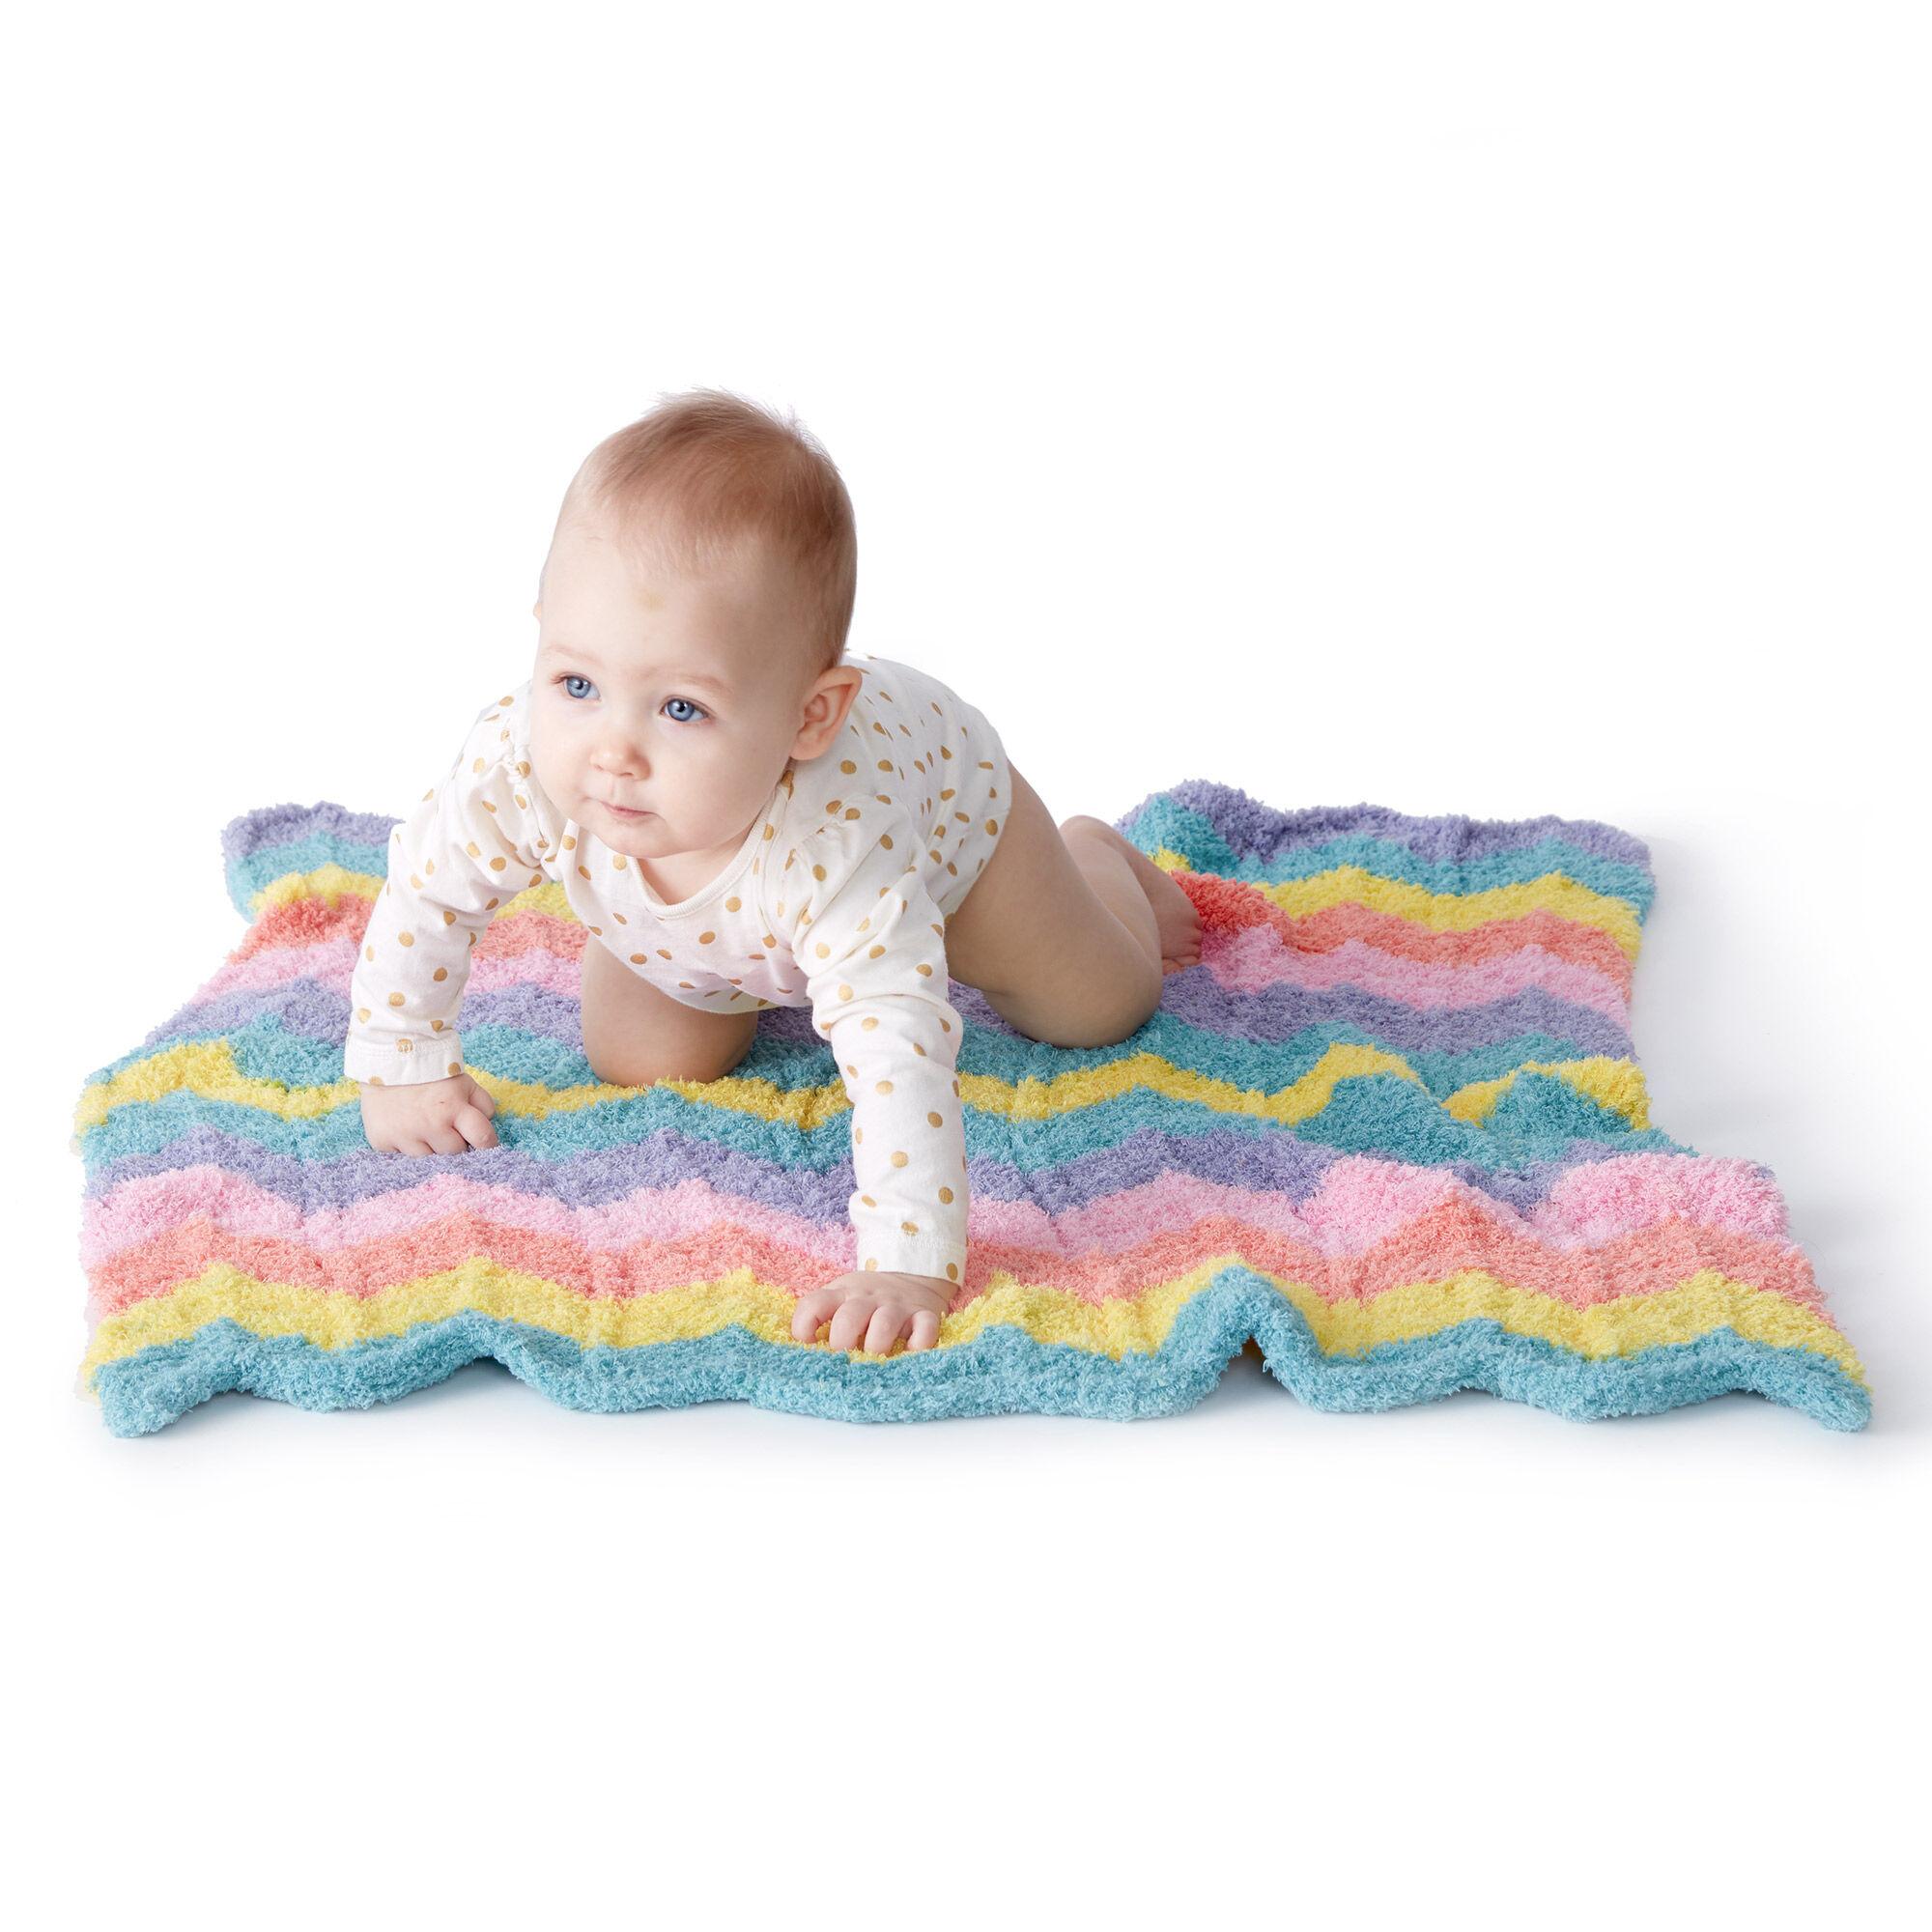 Bernat New Wave Knit Baby Blanket Pattern | Yarnspirations ...